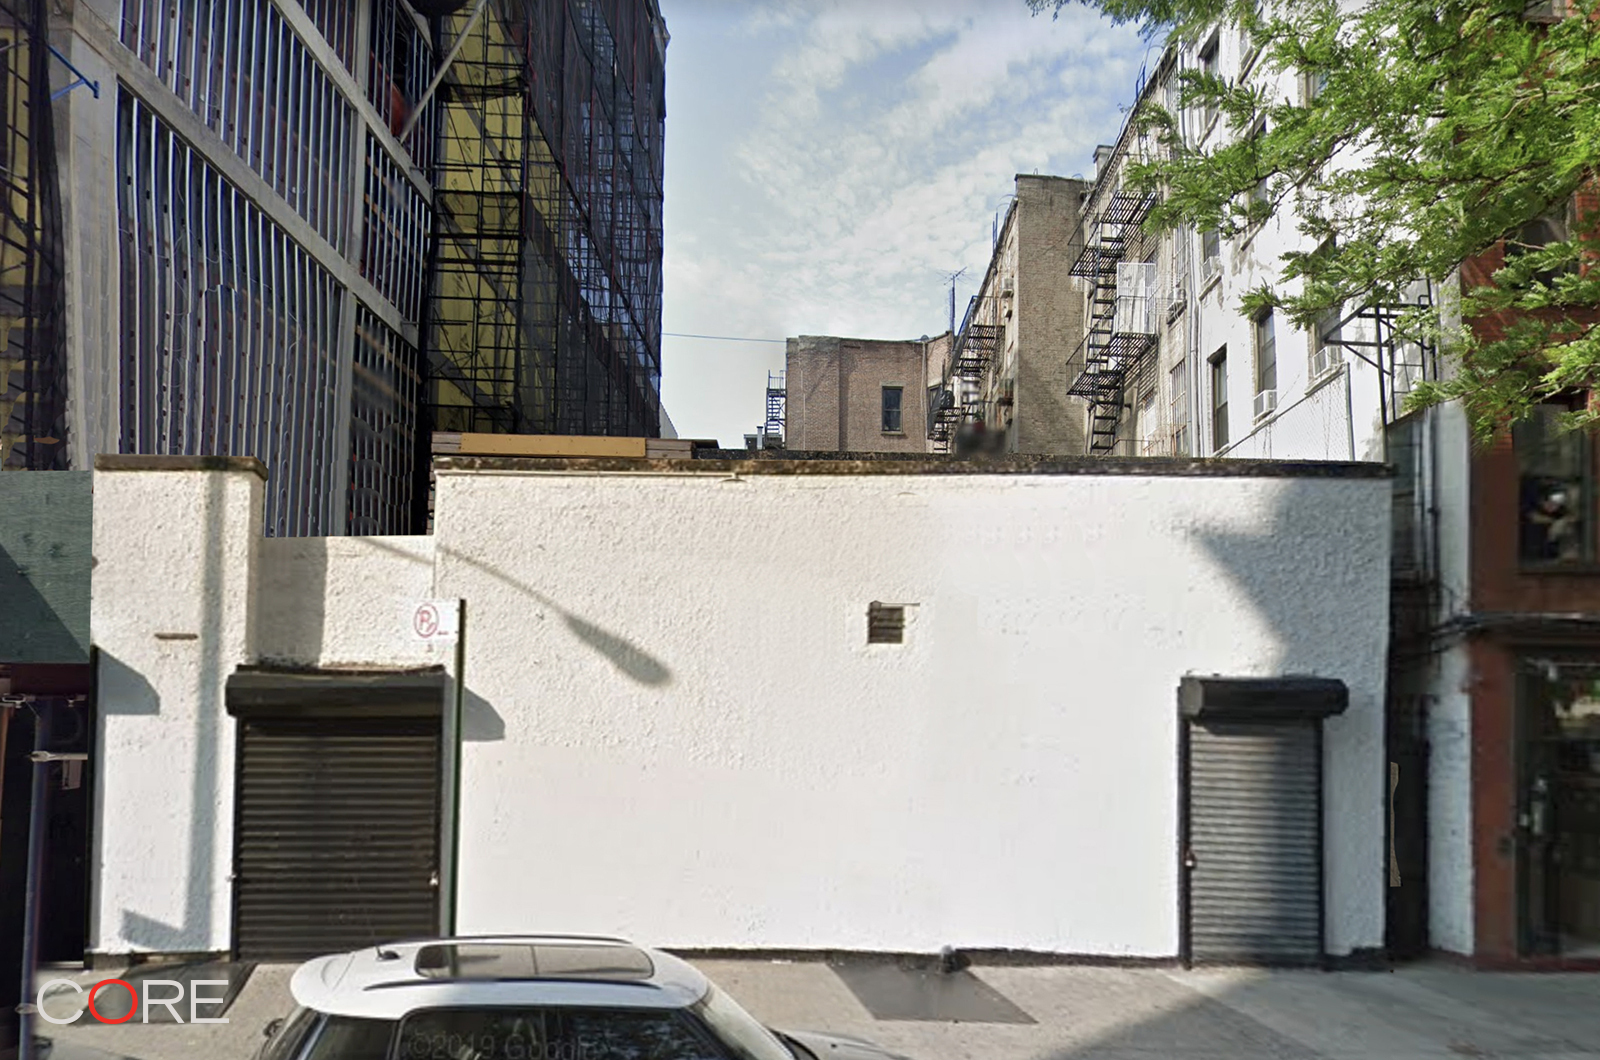 202 East 119th Street East Harlem New York NY 10035